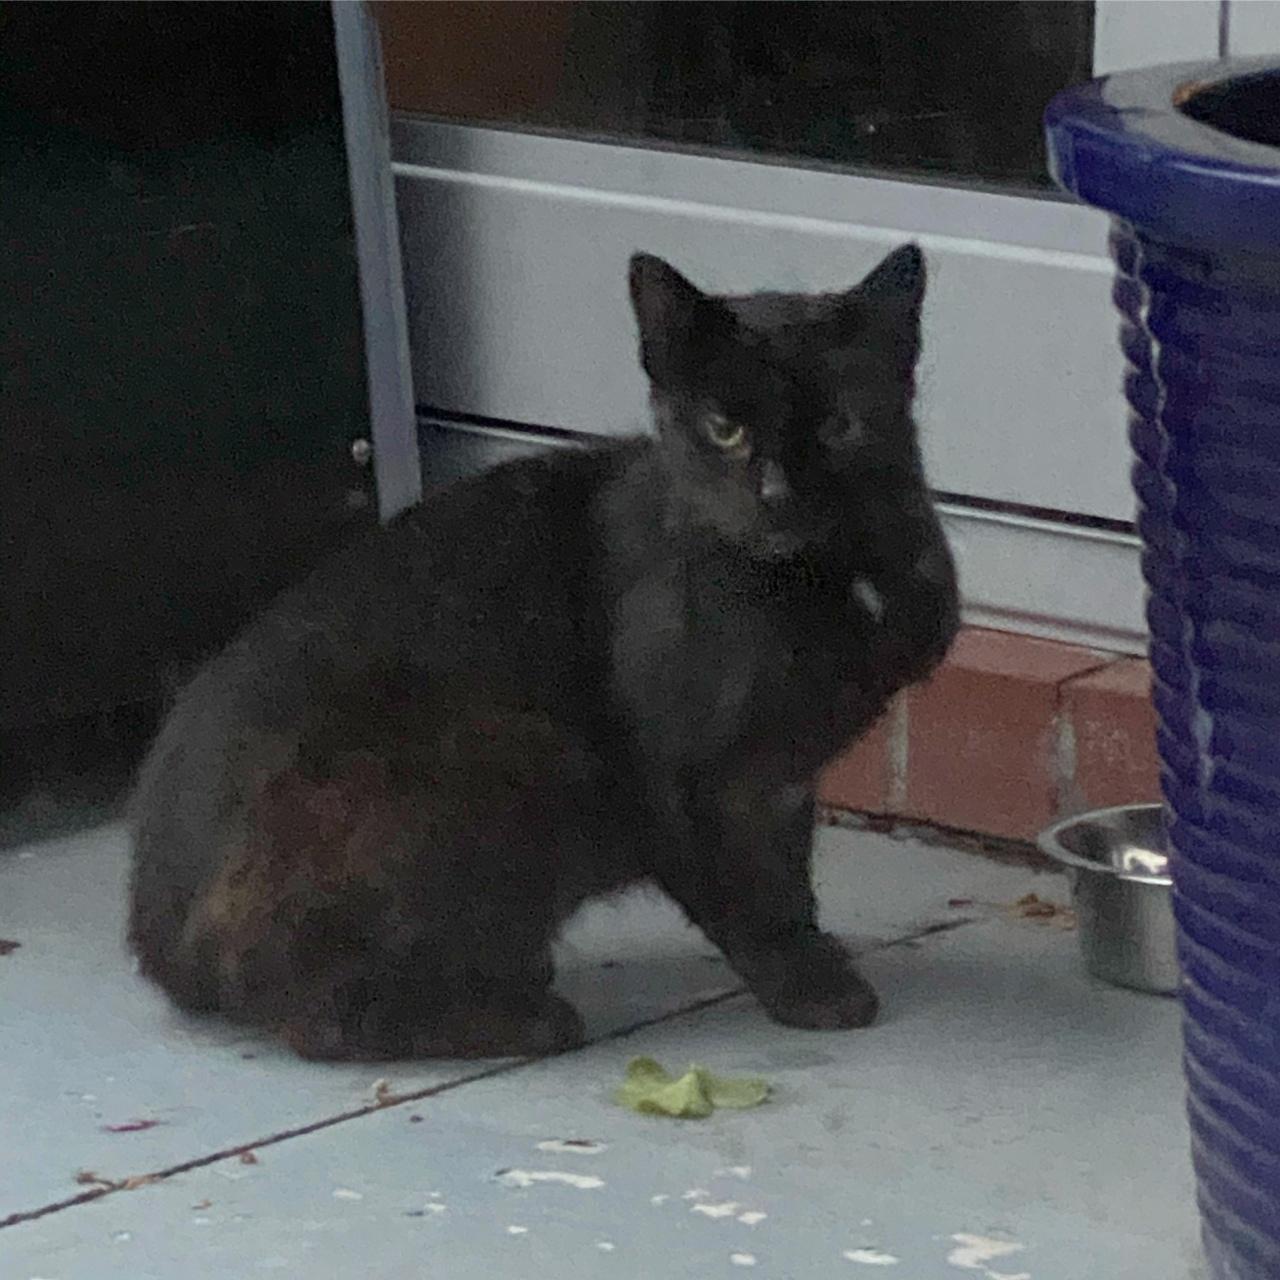 A black kitten sitting near the food bowl we gave it